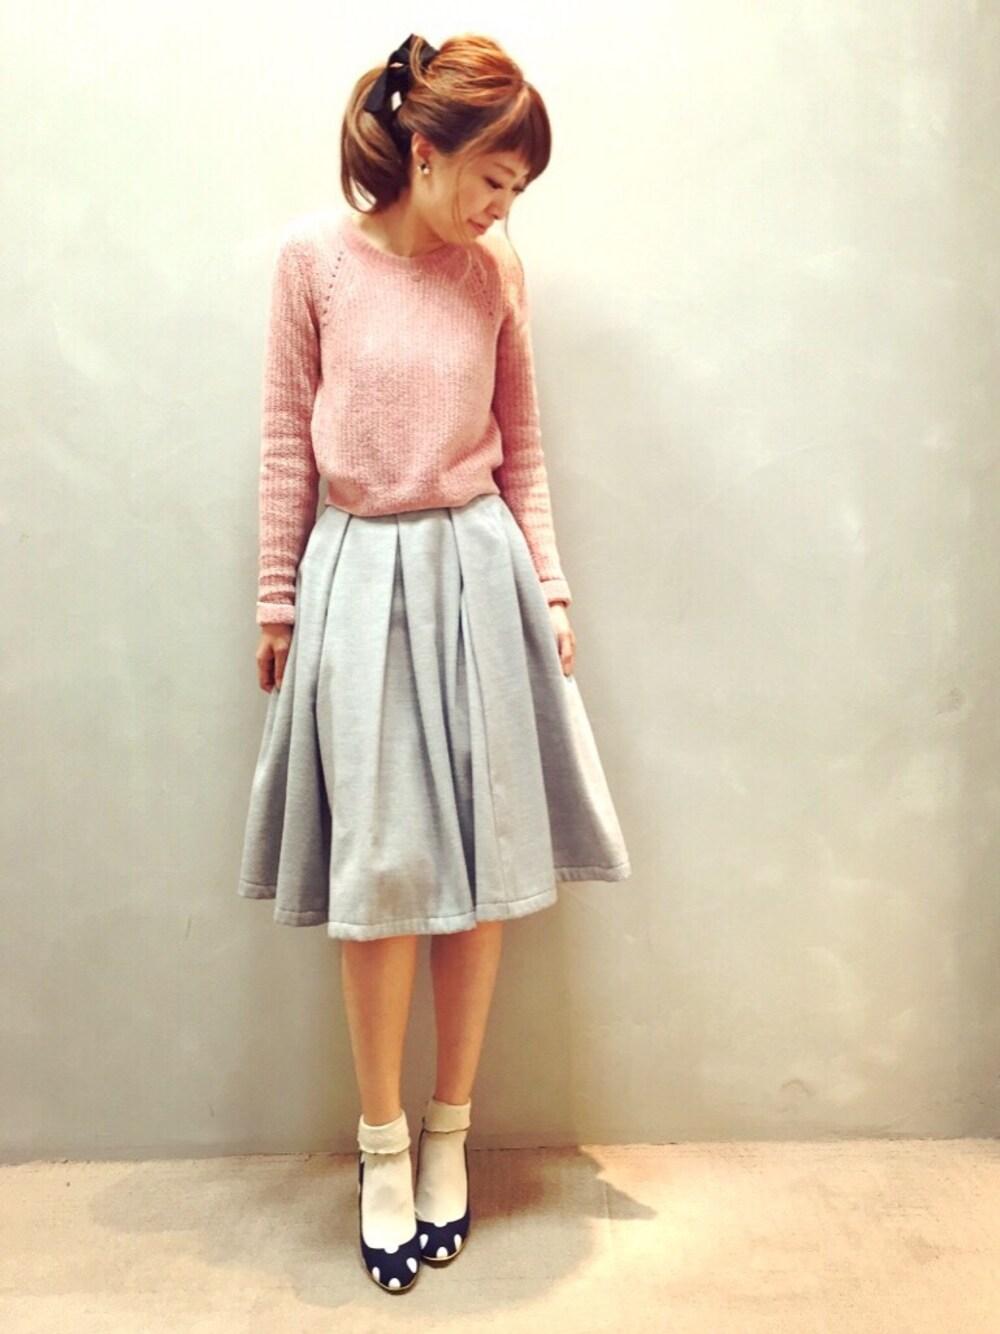 出典:http://wear.jp/kumei3310/3285590/